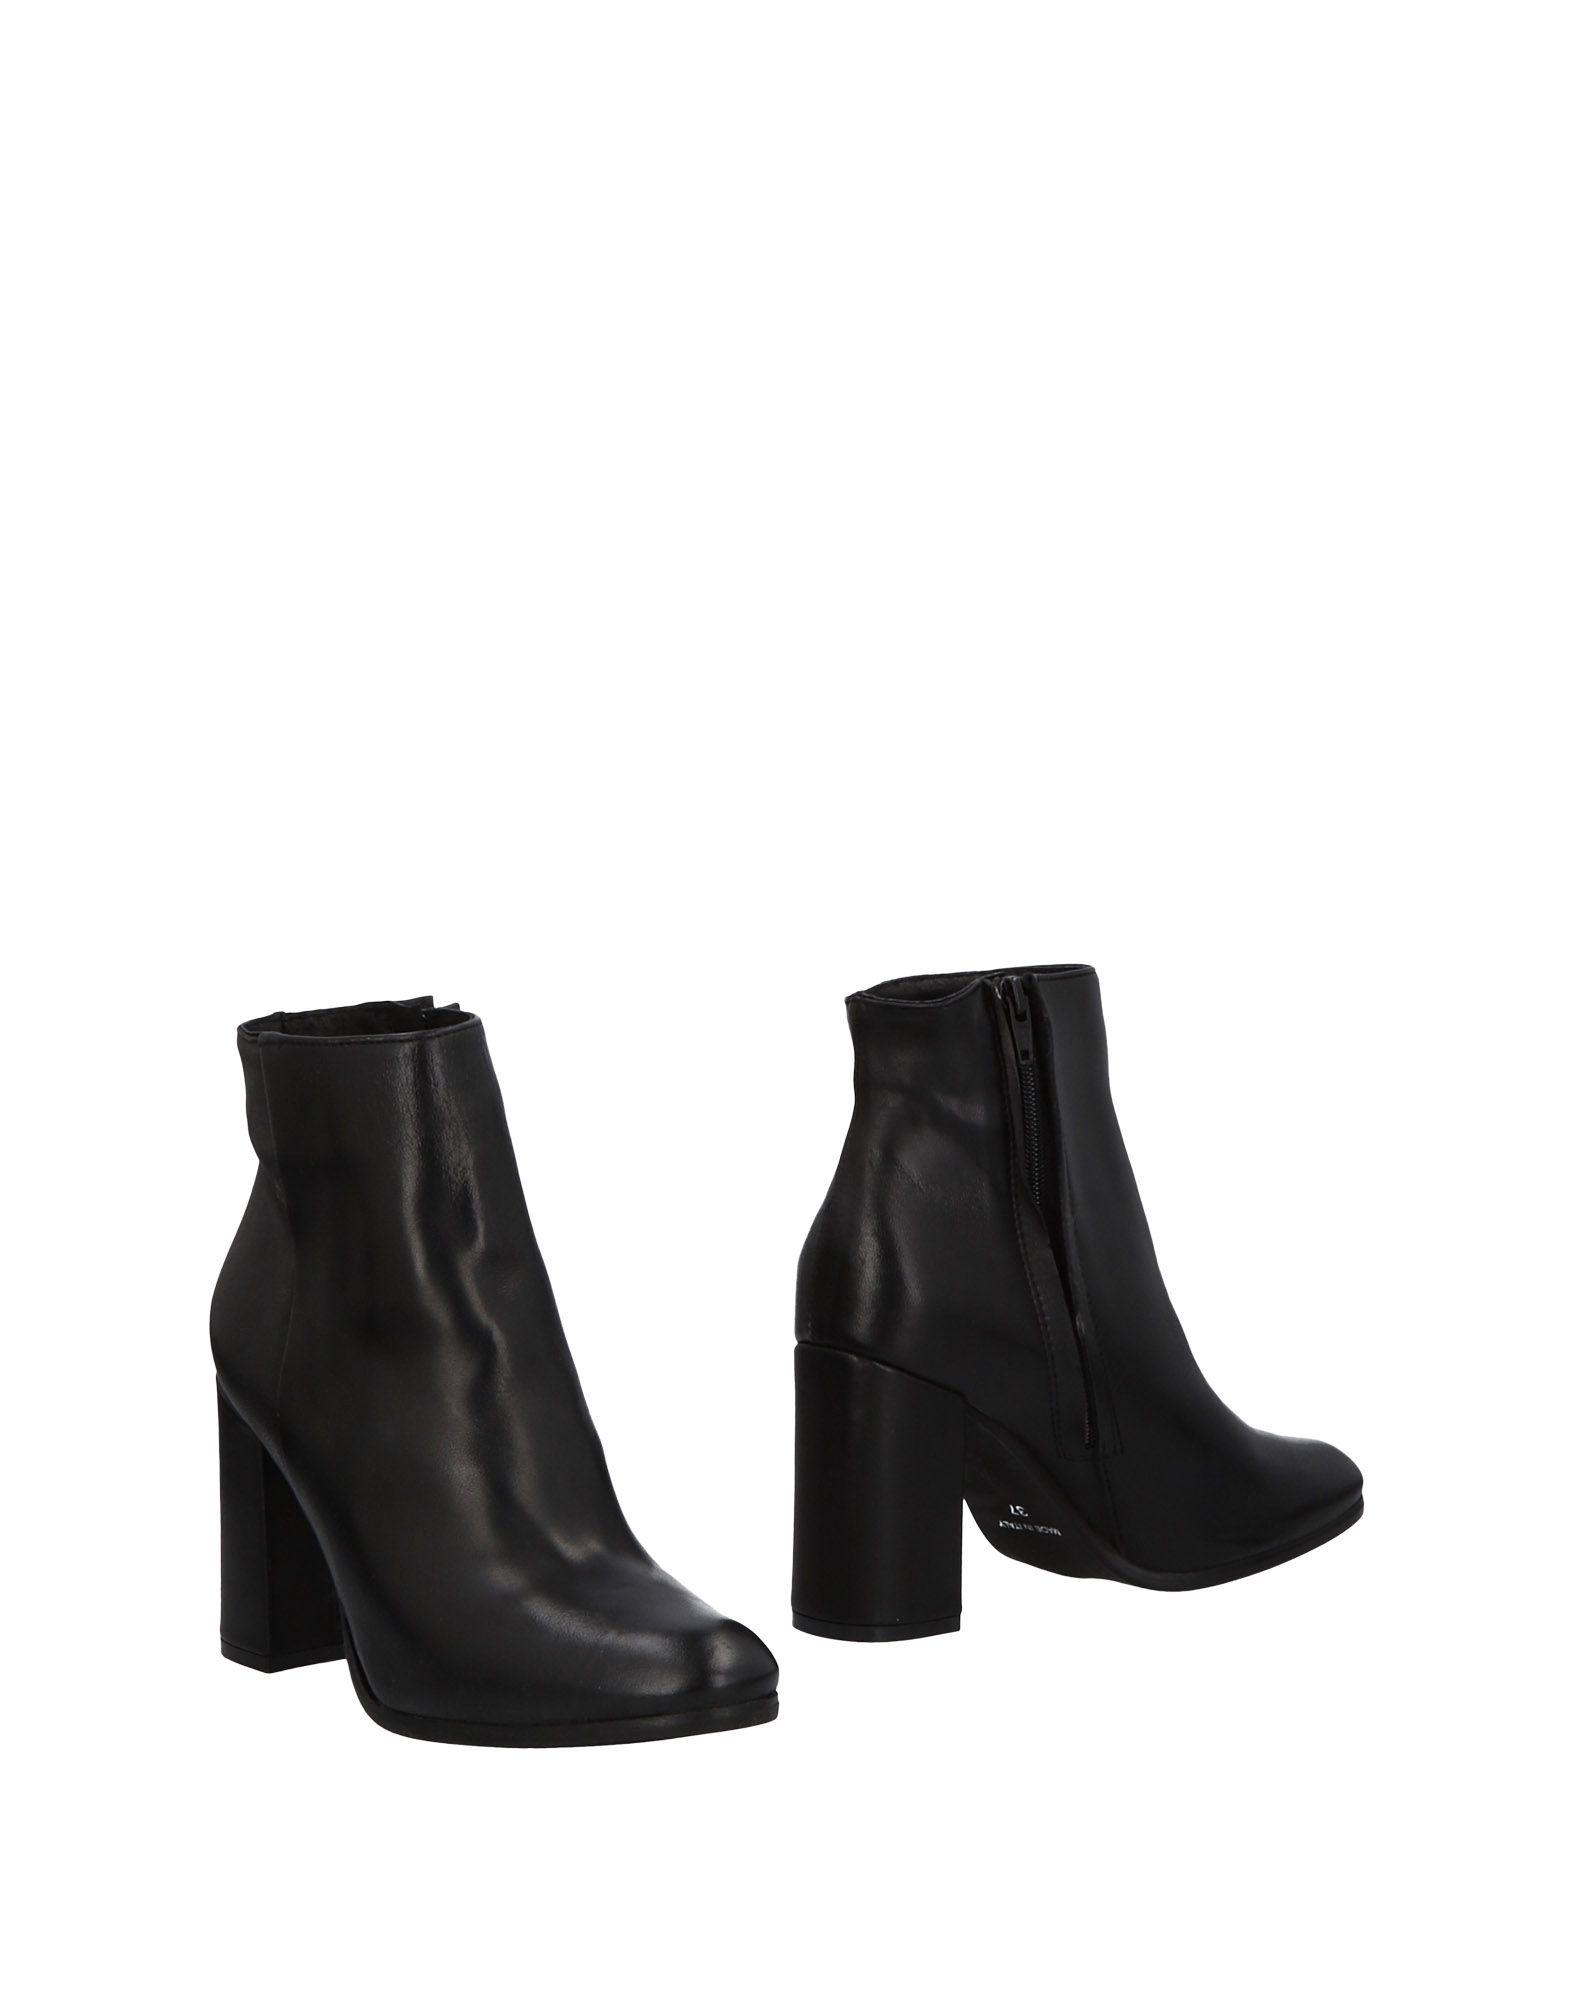 Silvian Heach Gute Stiefelette Damen  11469160JQ Gute Heach Qualität beliebte Schuhe d6c884